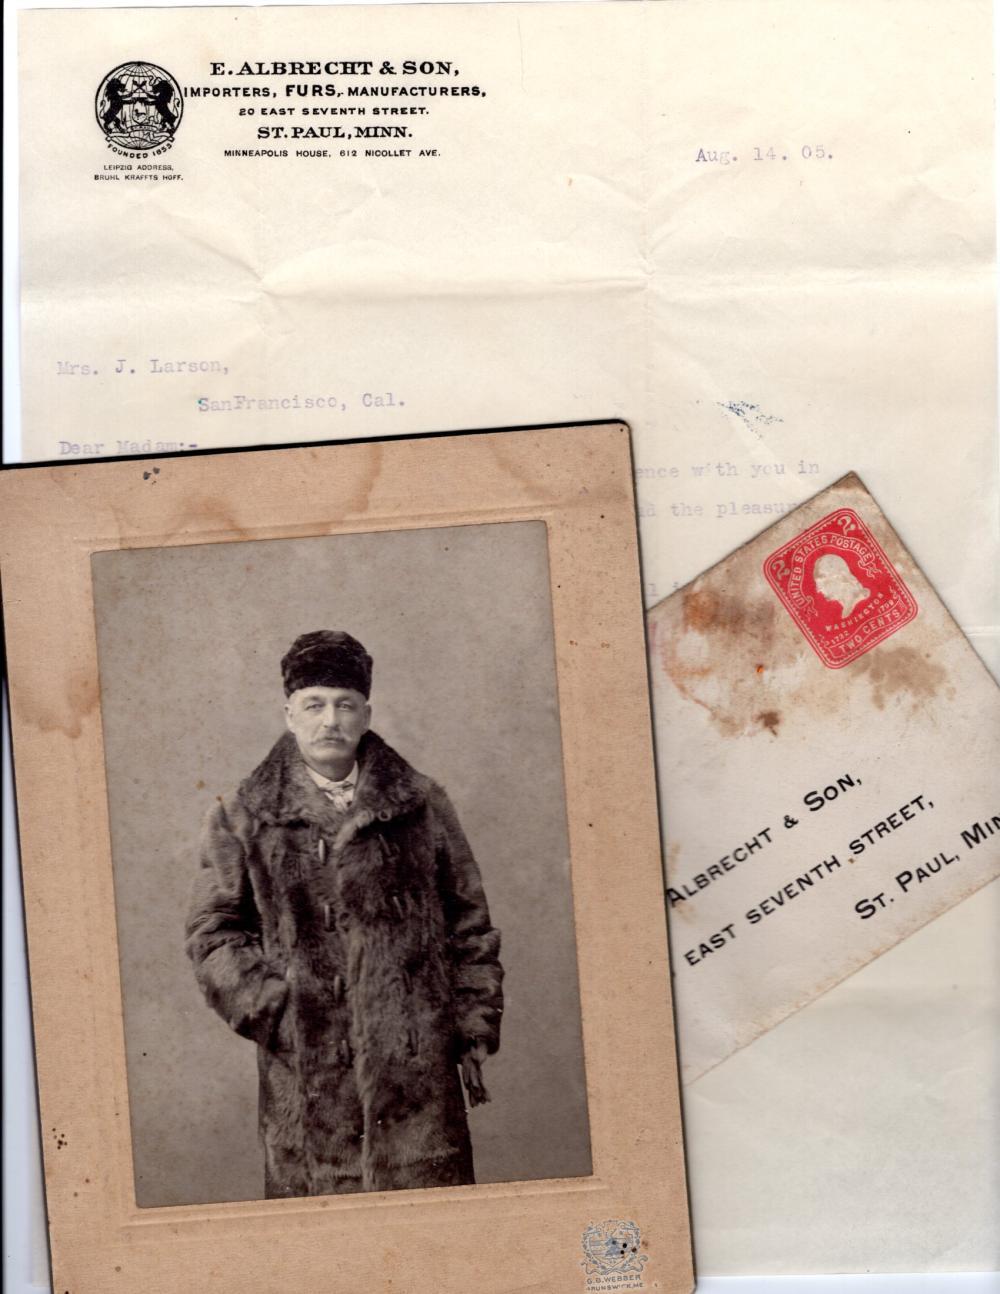 Man in a fur coat, 1905